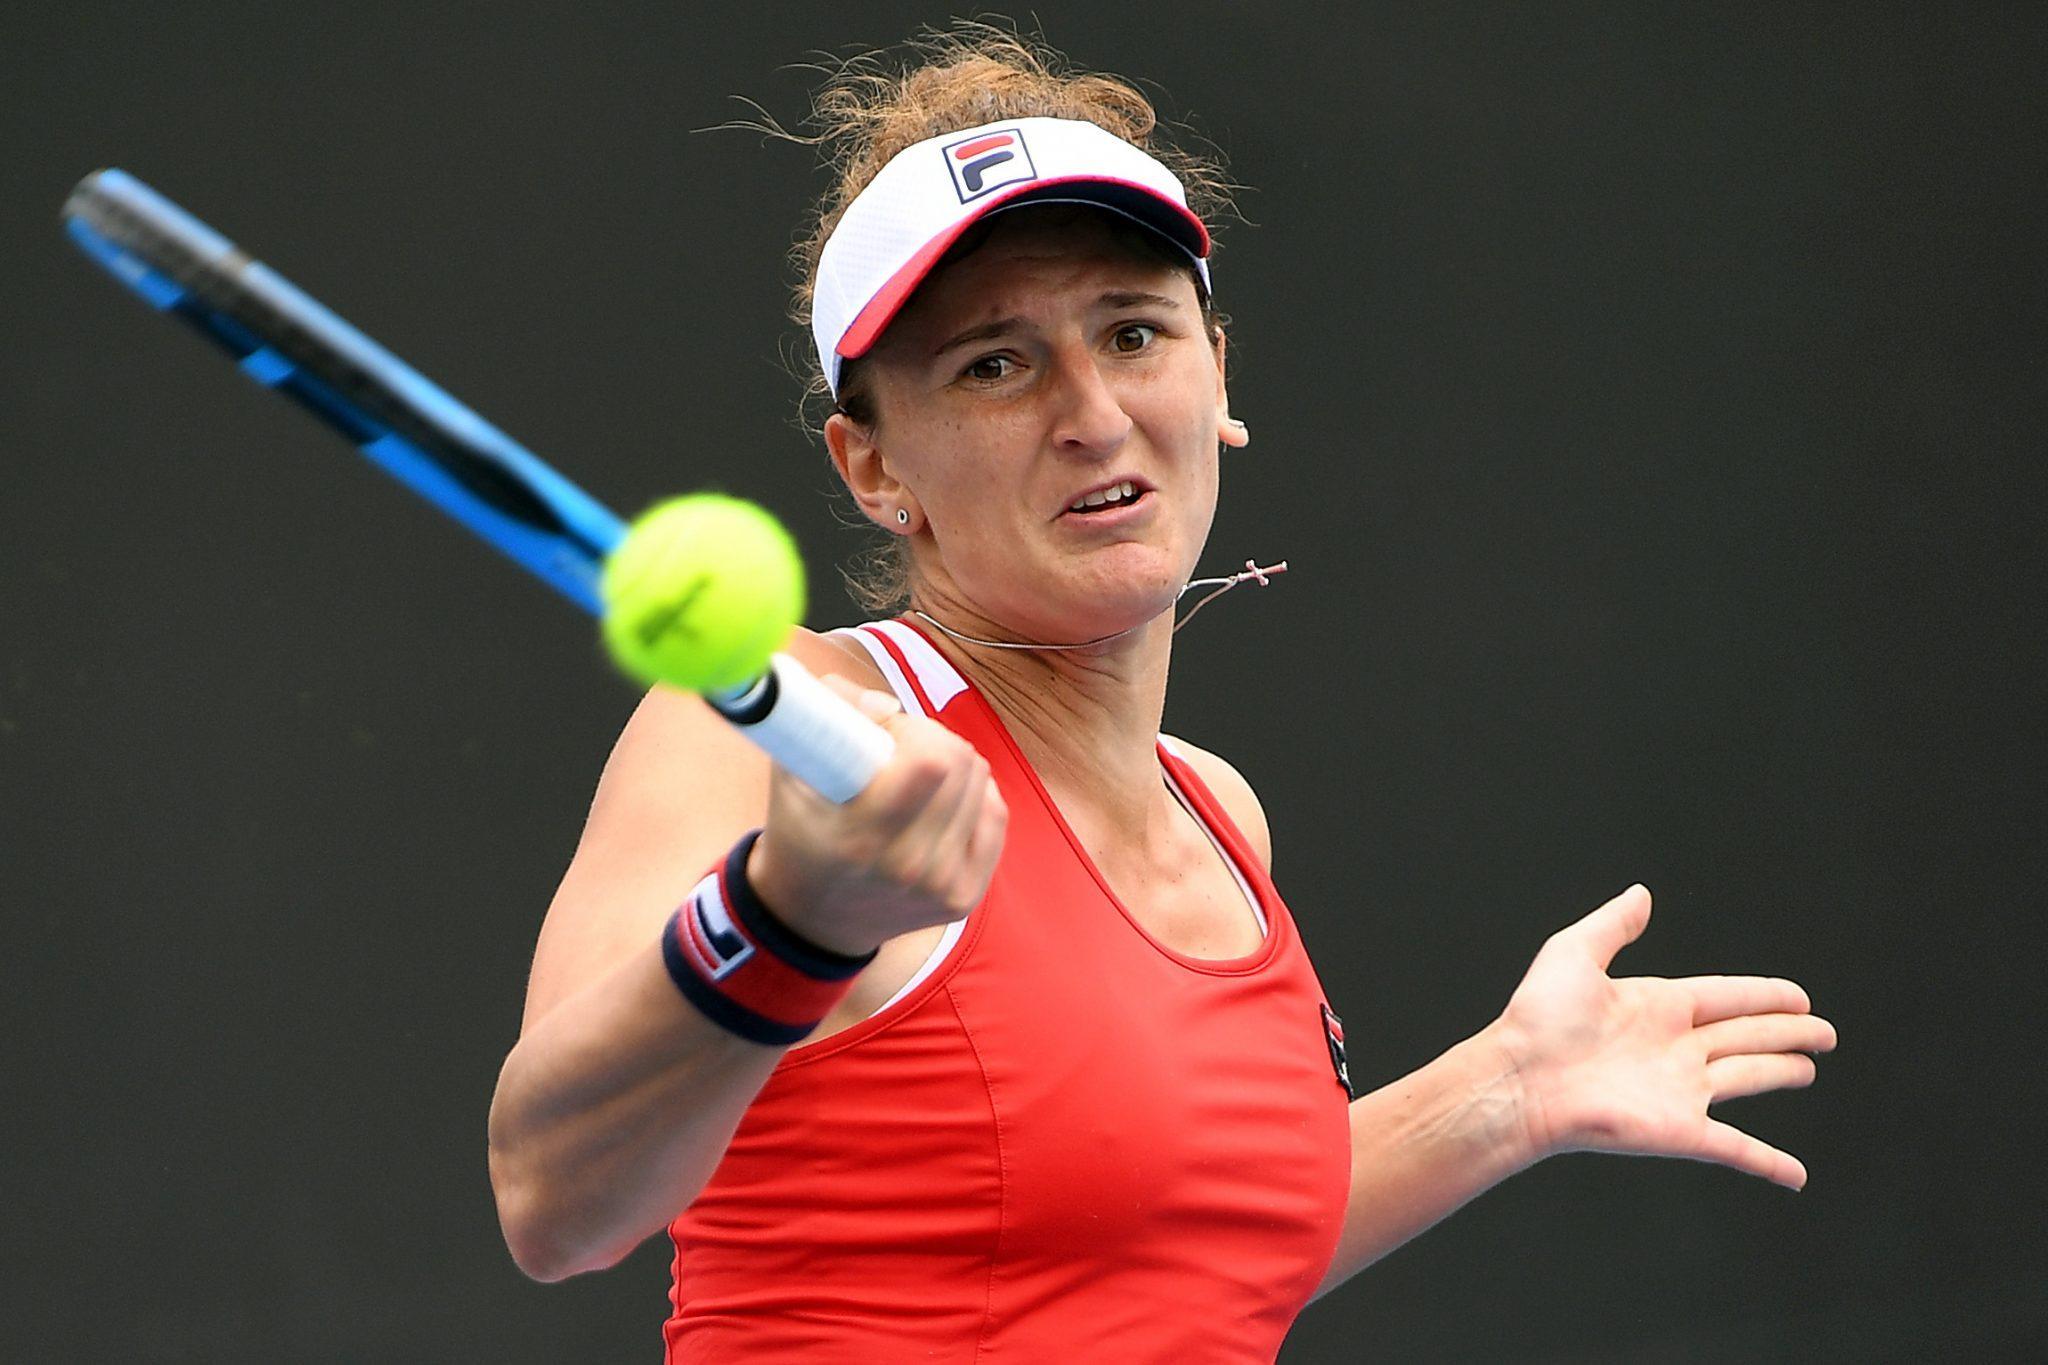 Romania's Irina-Camelia Begu reacts during her match ...  |Irina Begu